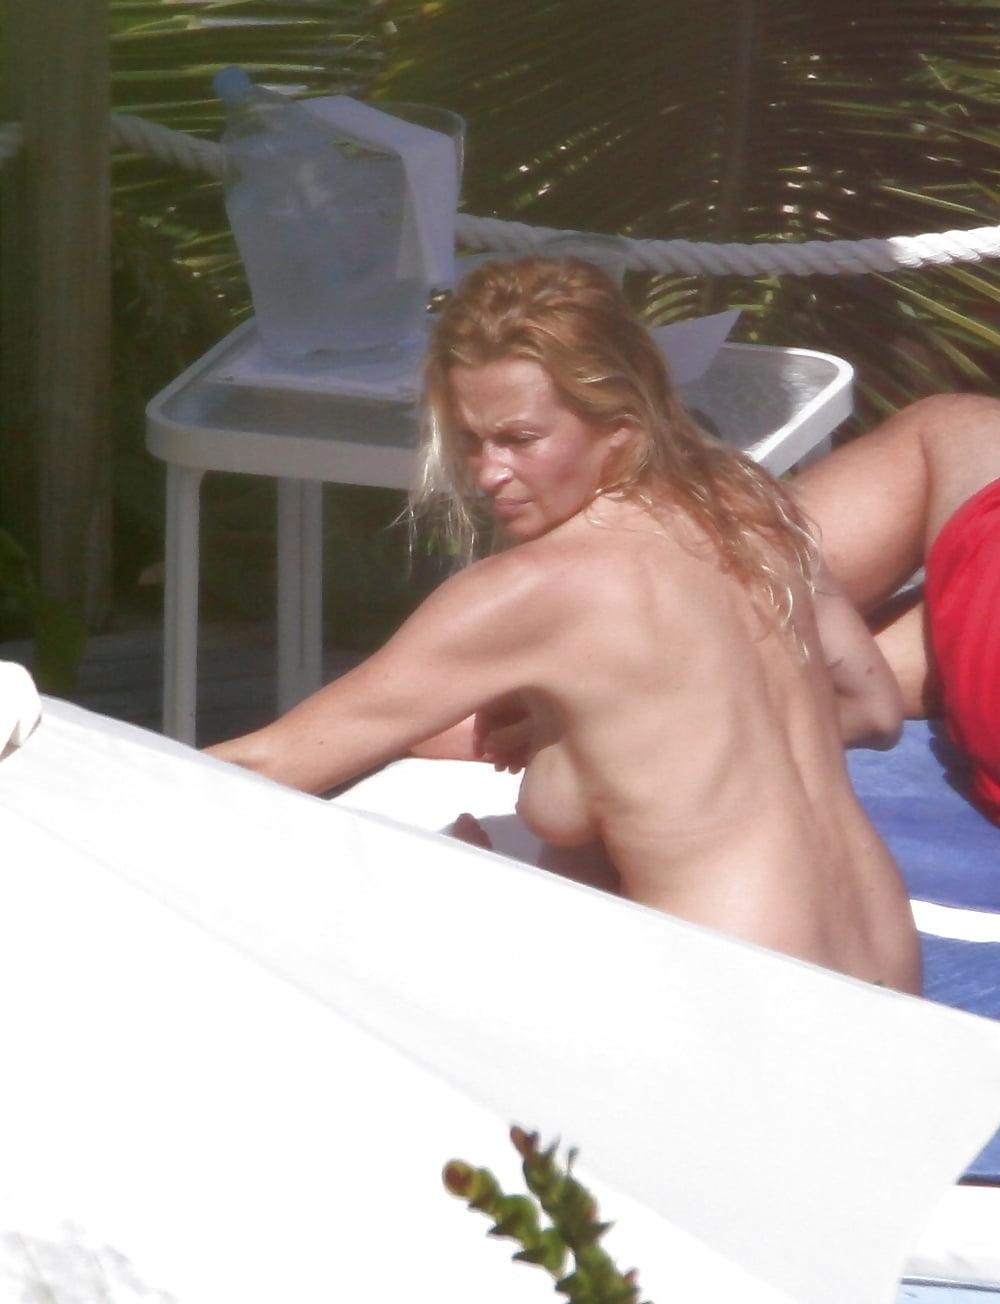 Chastity corset bondage stories